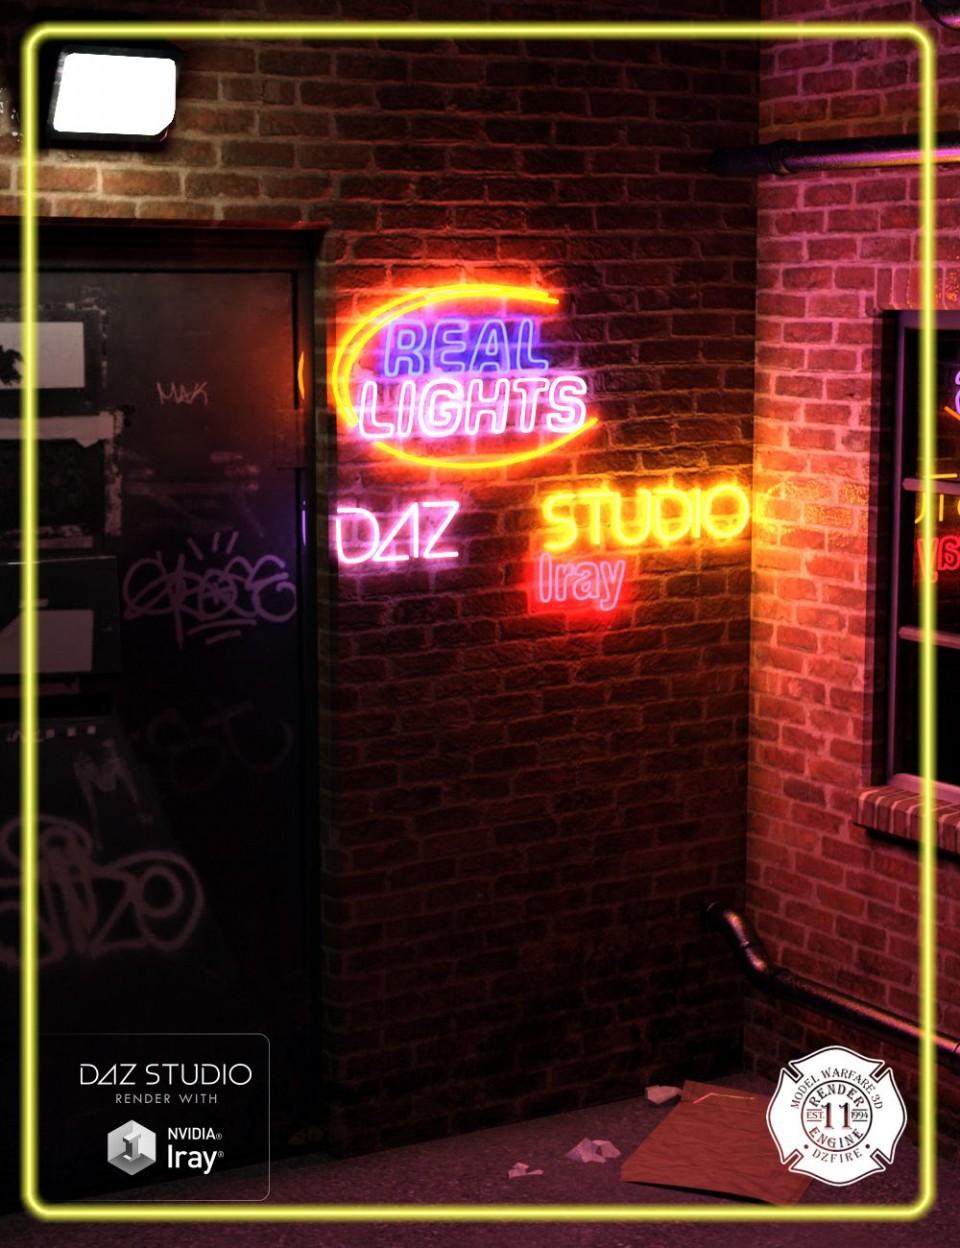 Poser and DAZ Studio 3D Models: Shader|DAZ Studio and Poser